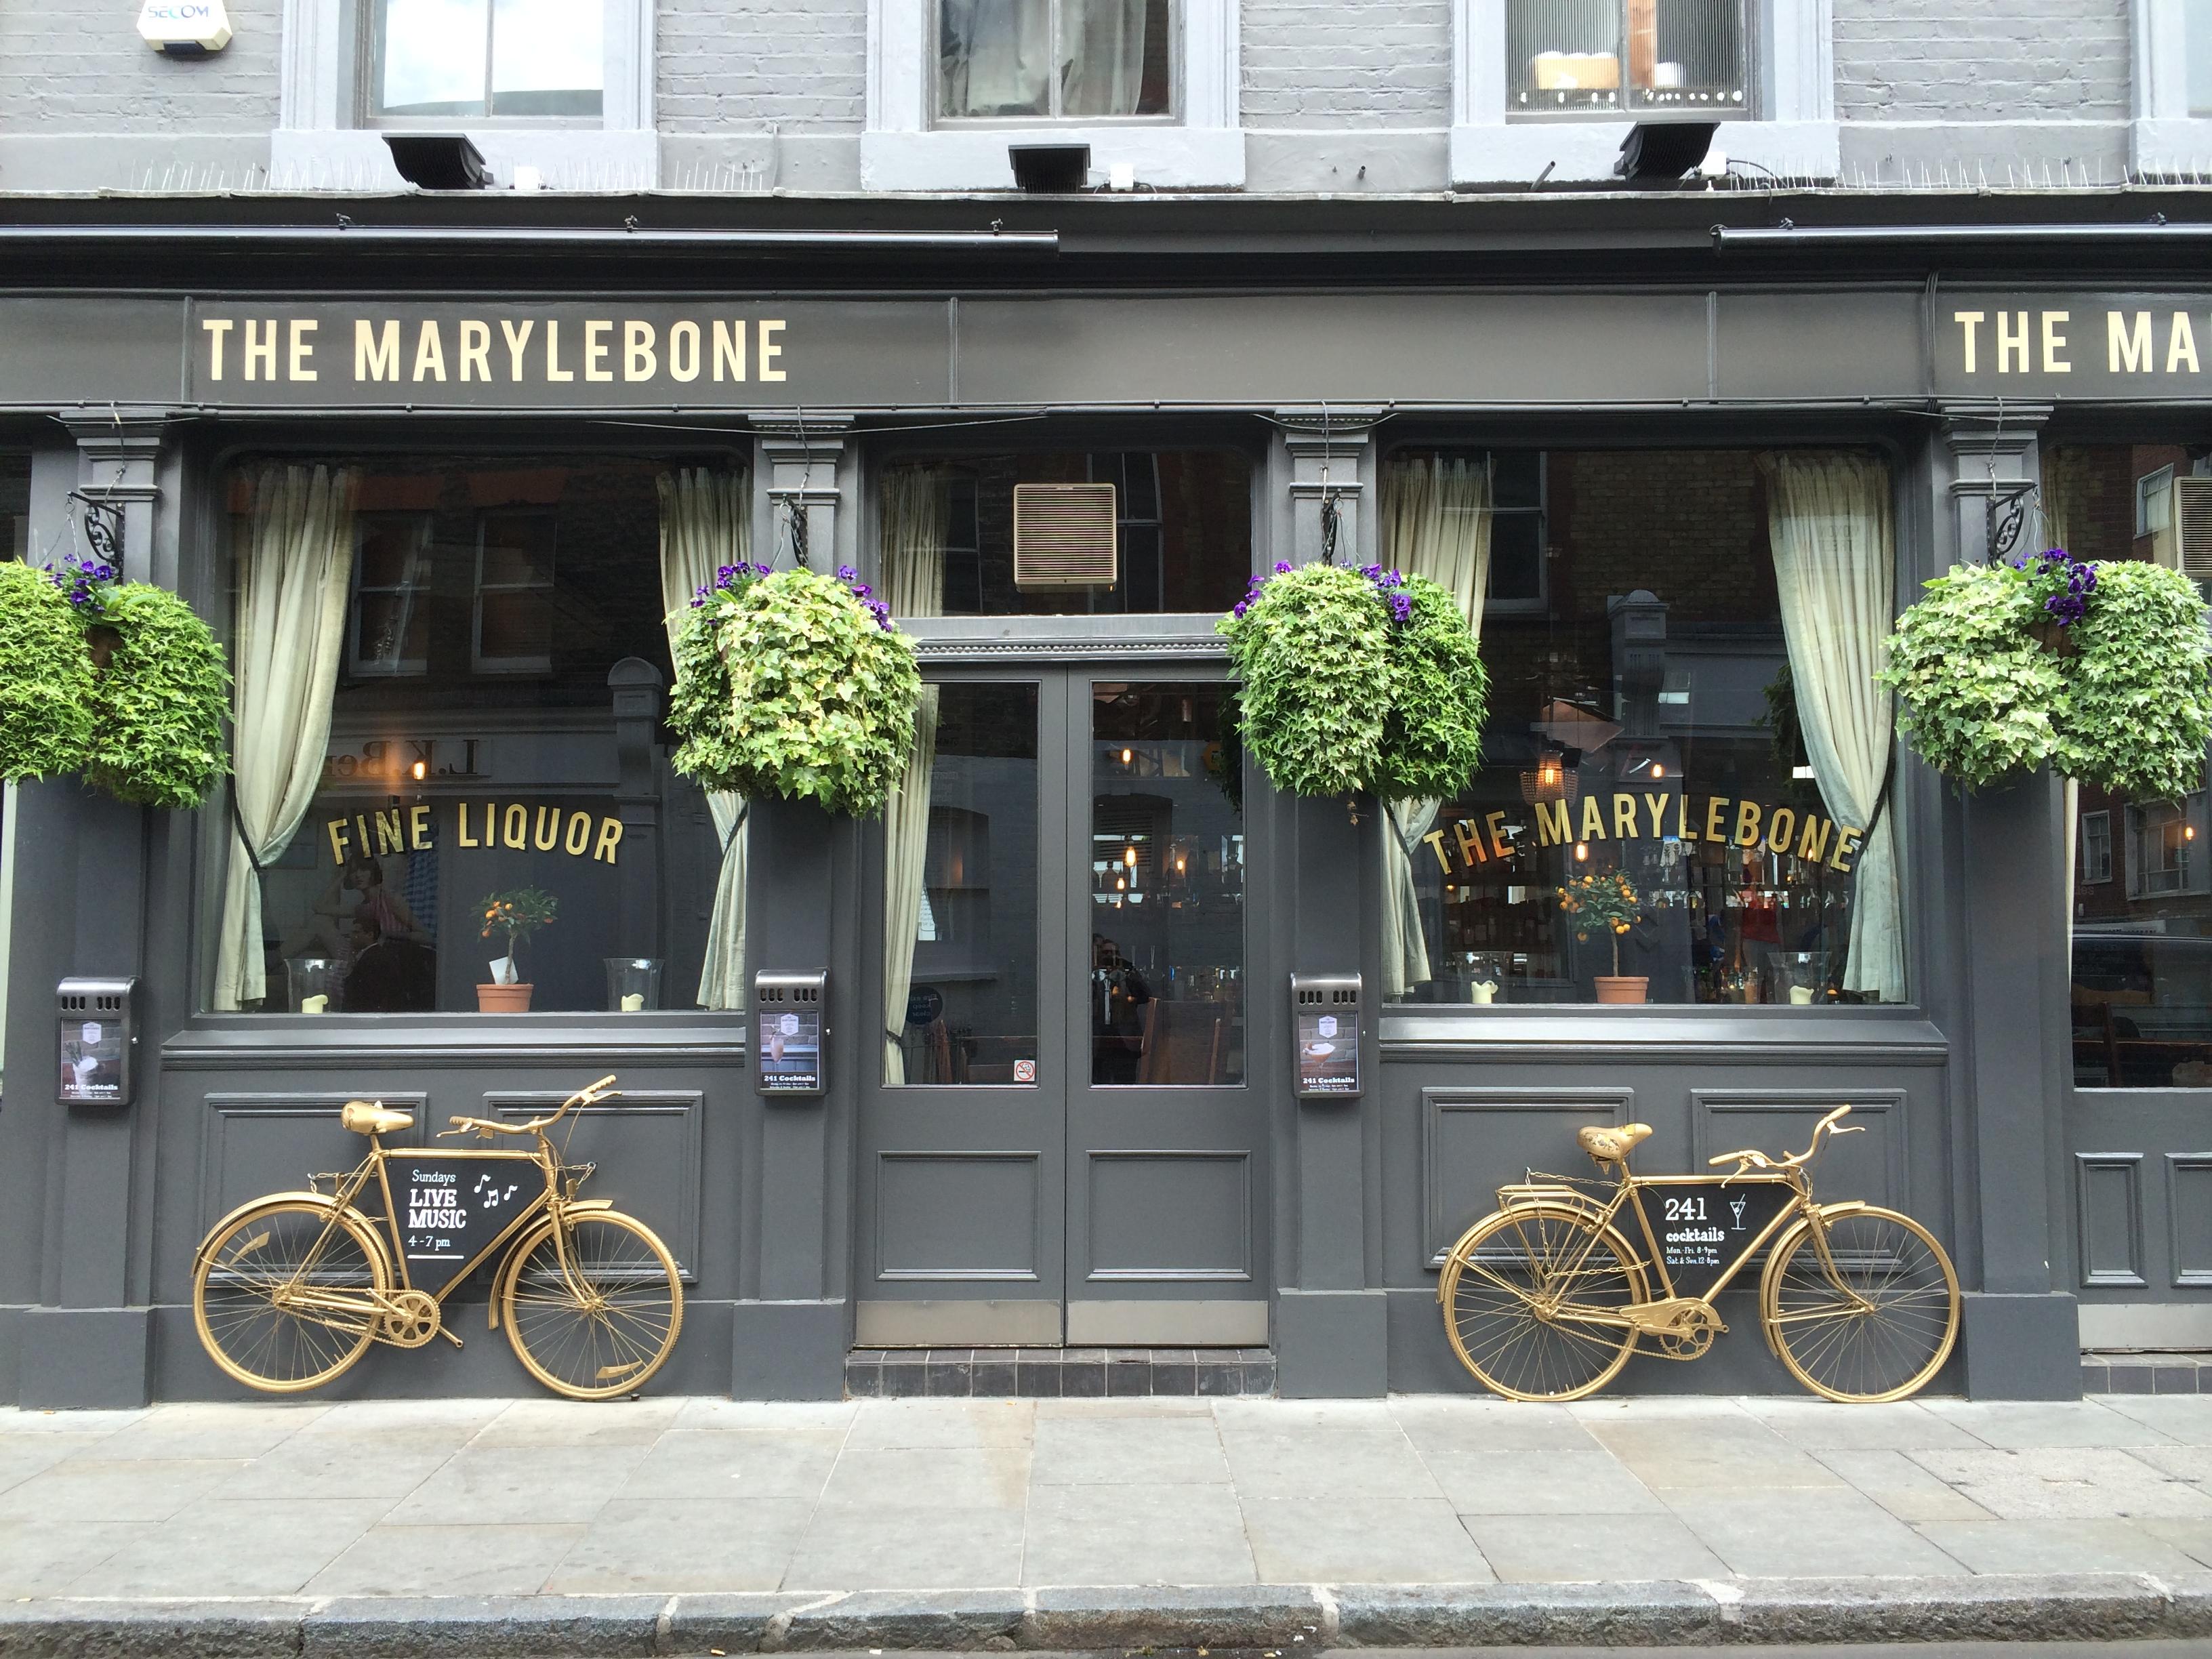 TheMarylebone